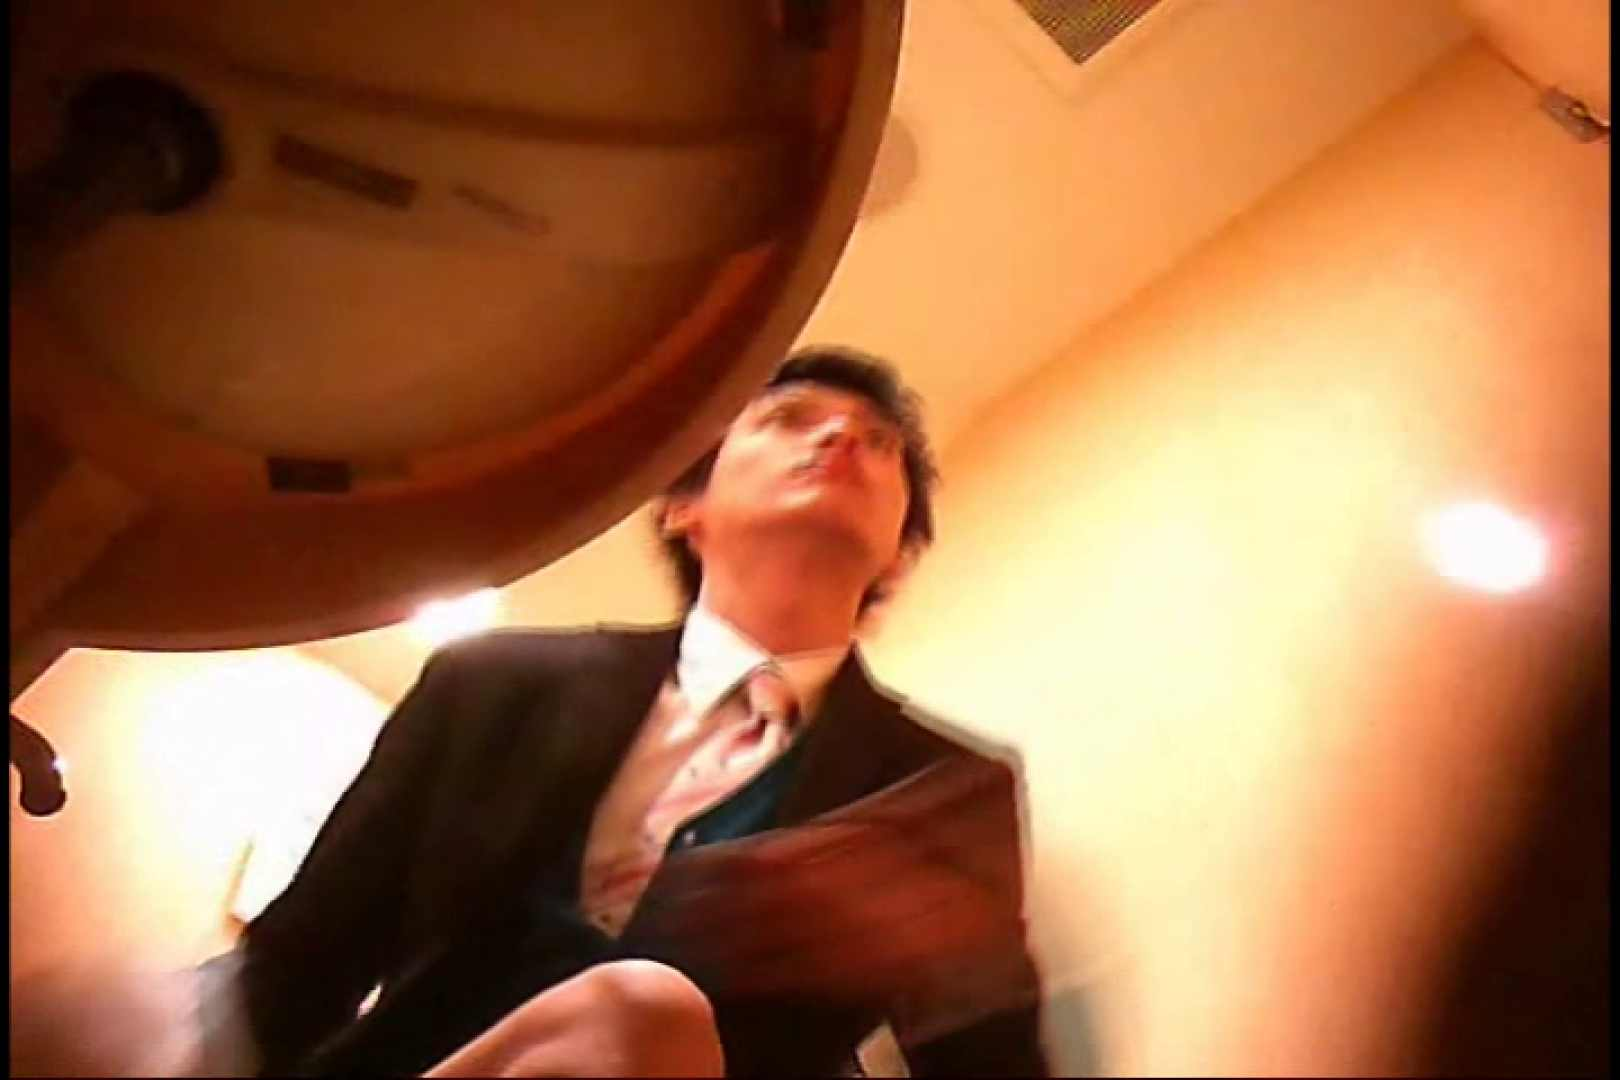 Gボーイ初投稿!掴み取りさんの洗面所覗き!in新幹線!VOL.04 完全無修正版 ゲイ無修正ビデオ画像 65枚 32